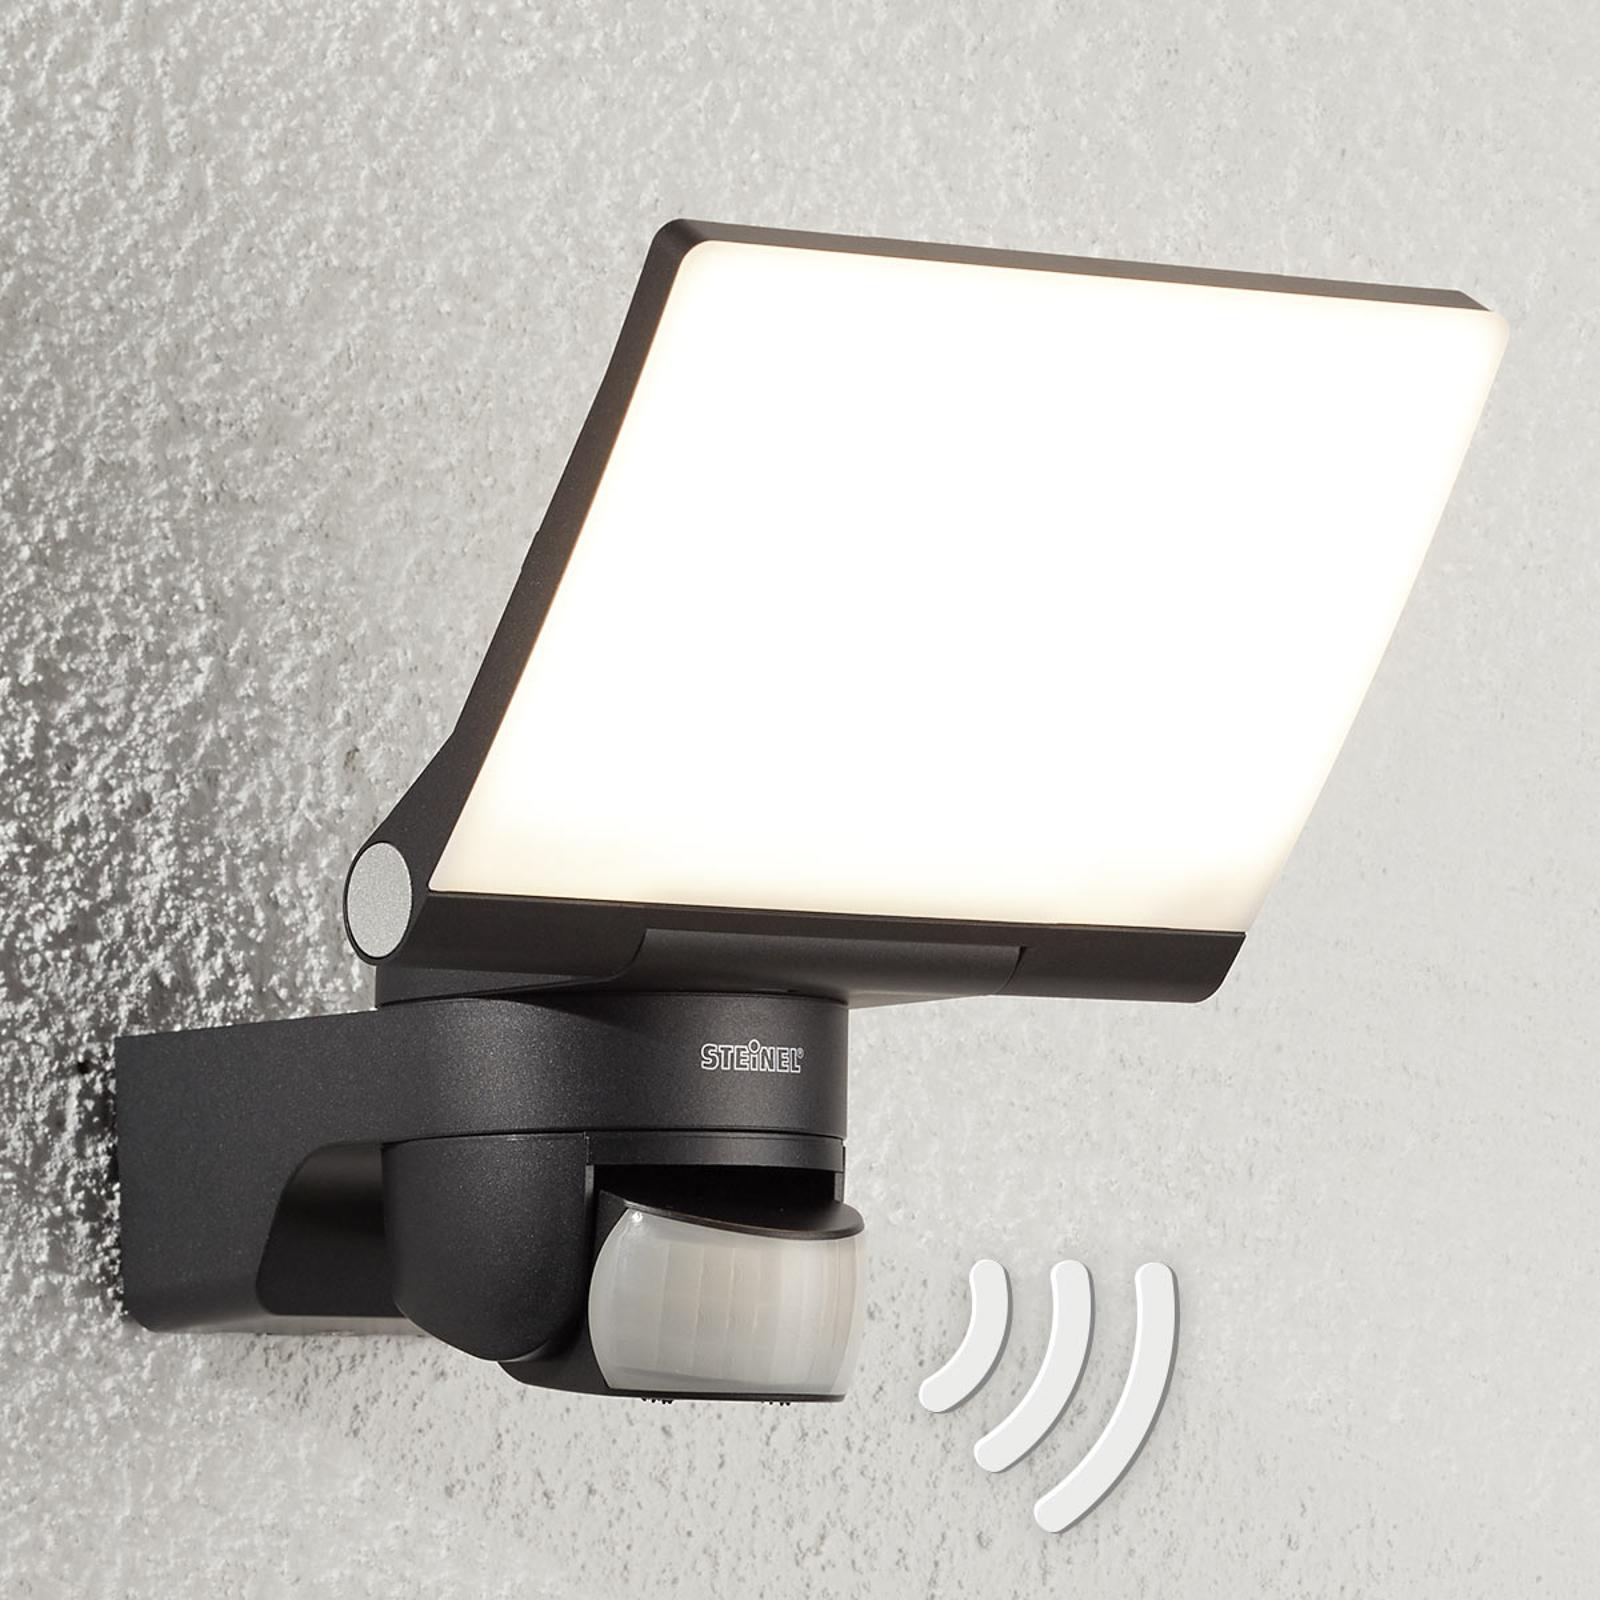 STEINEL XLED Home 2 XL LED-sensorspotlight grafit